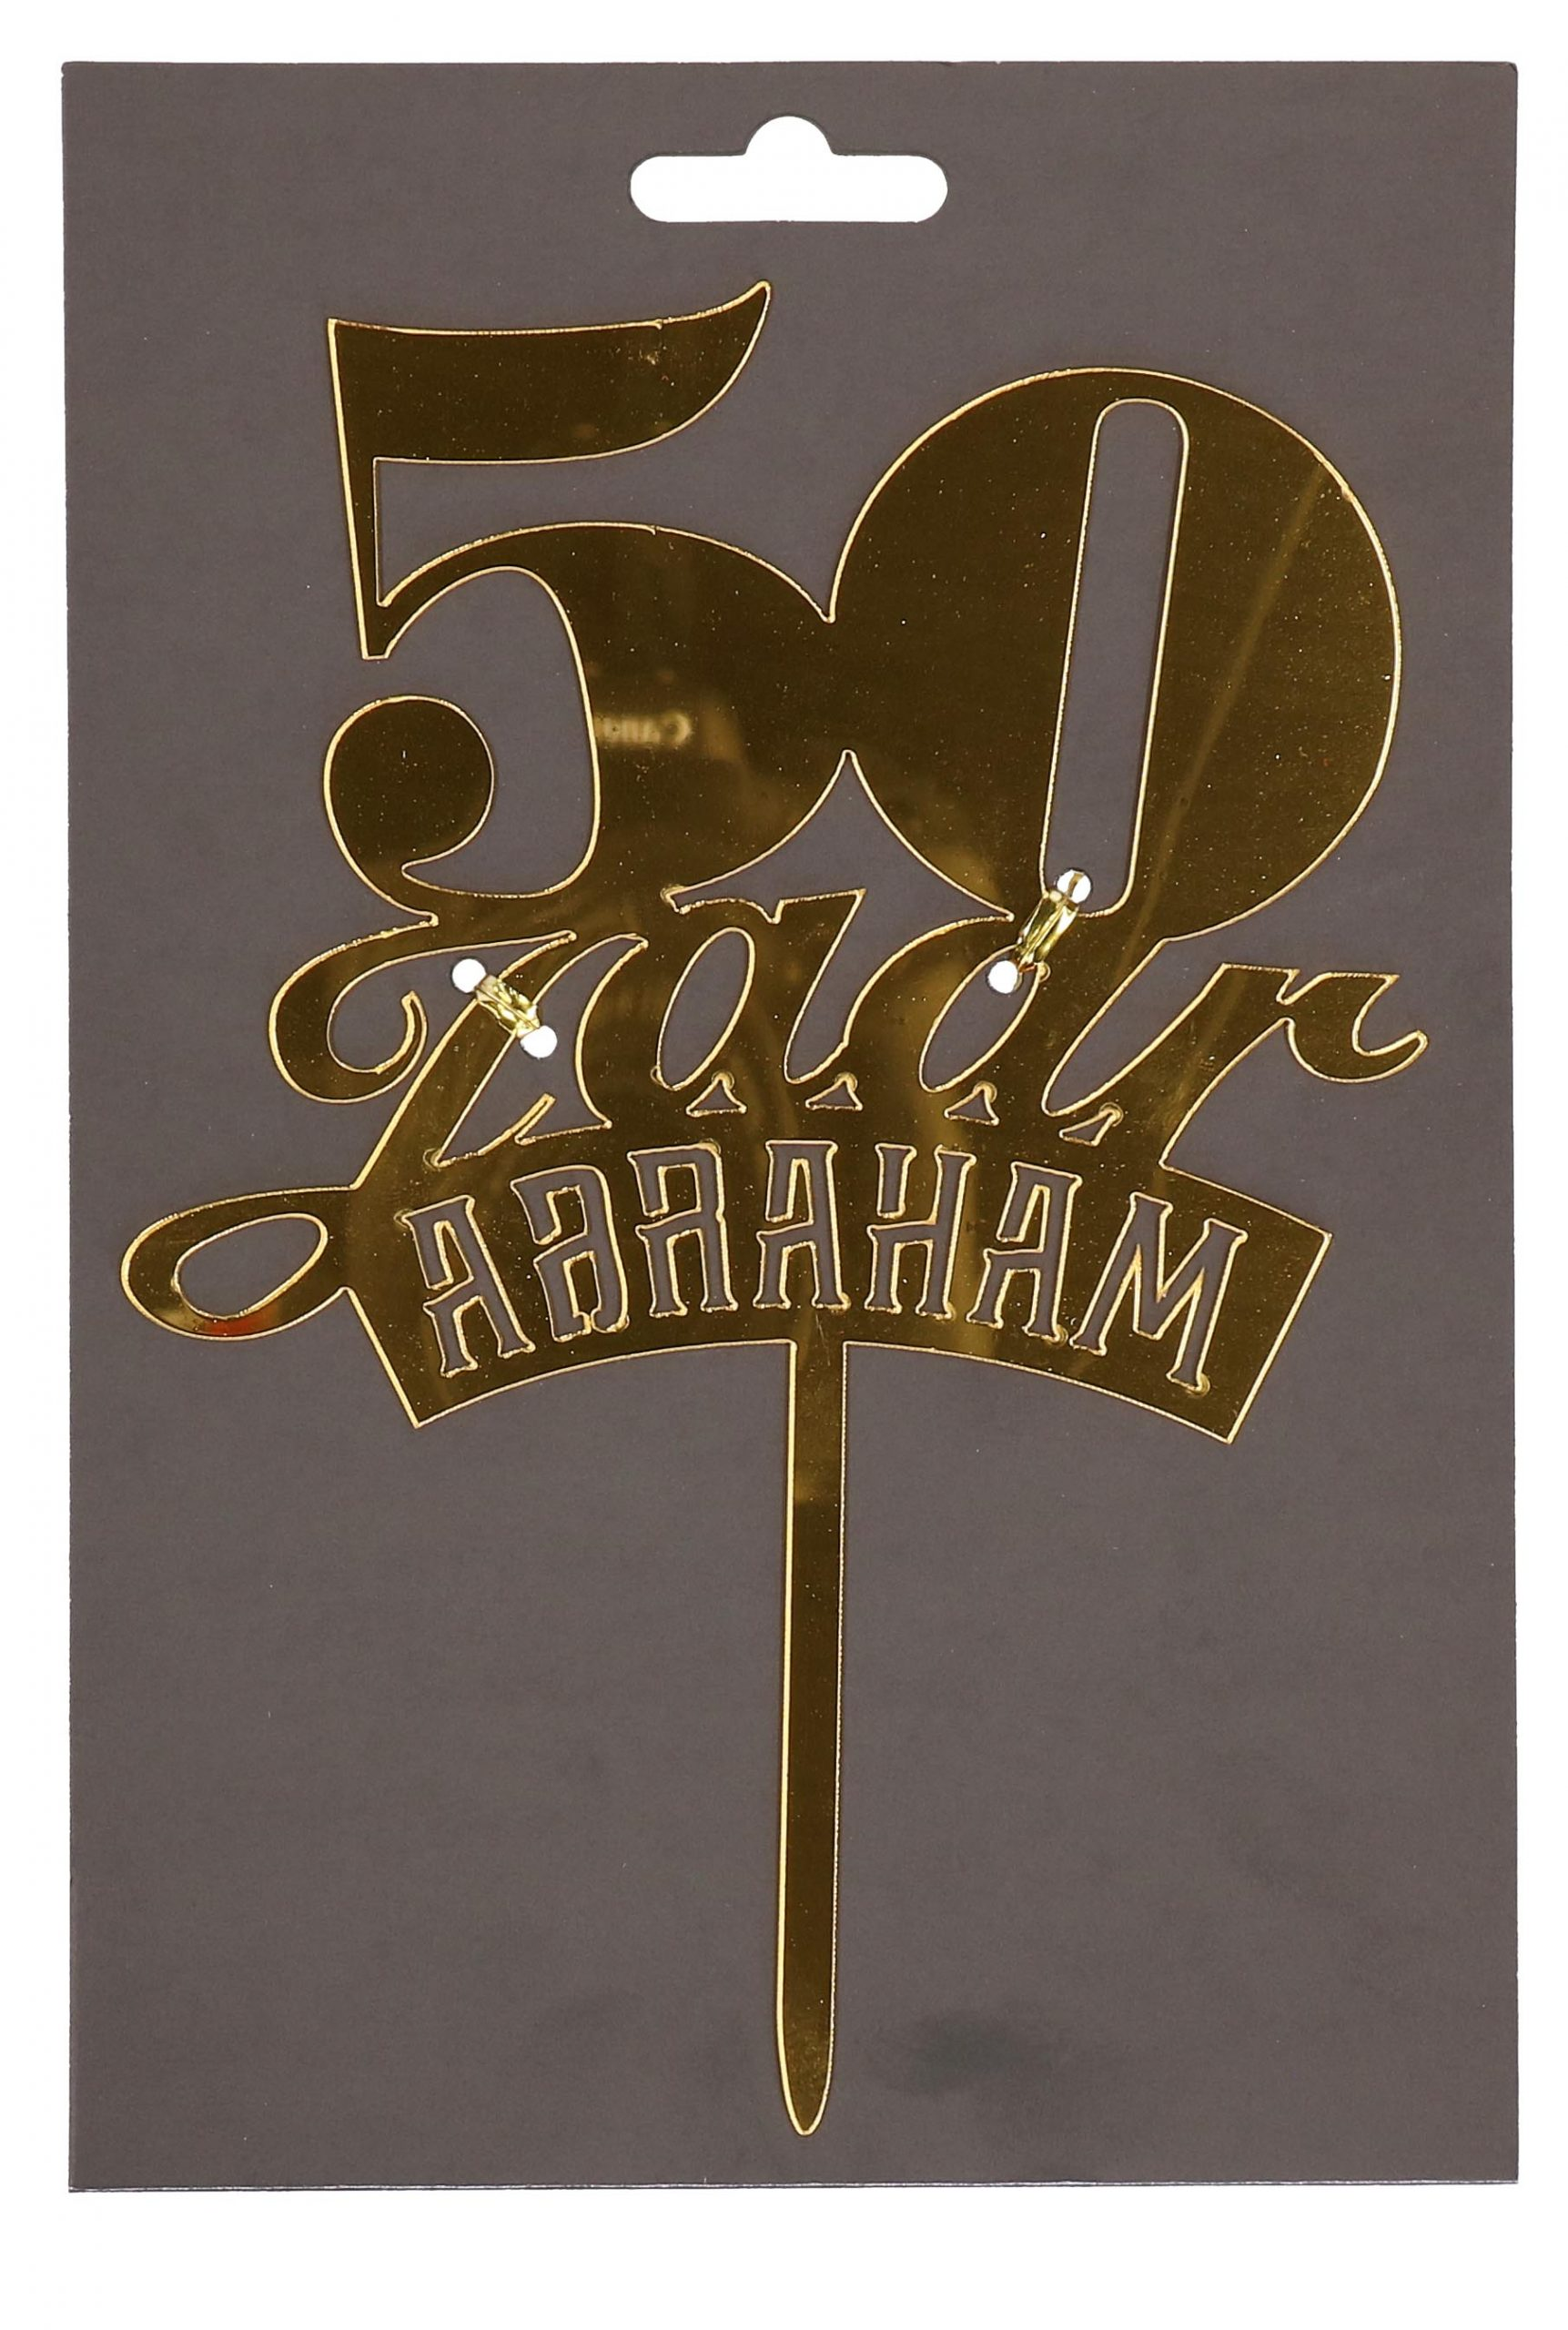 Taartprikker 50 jaar abraham